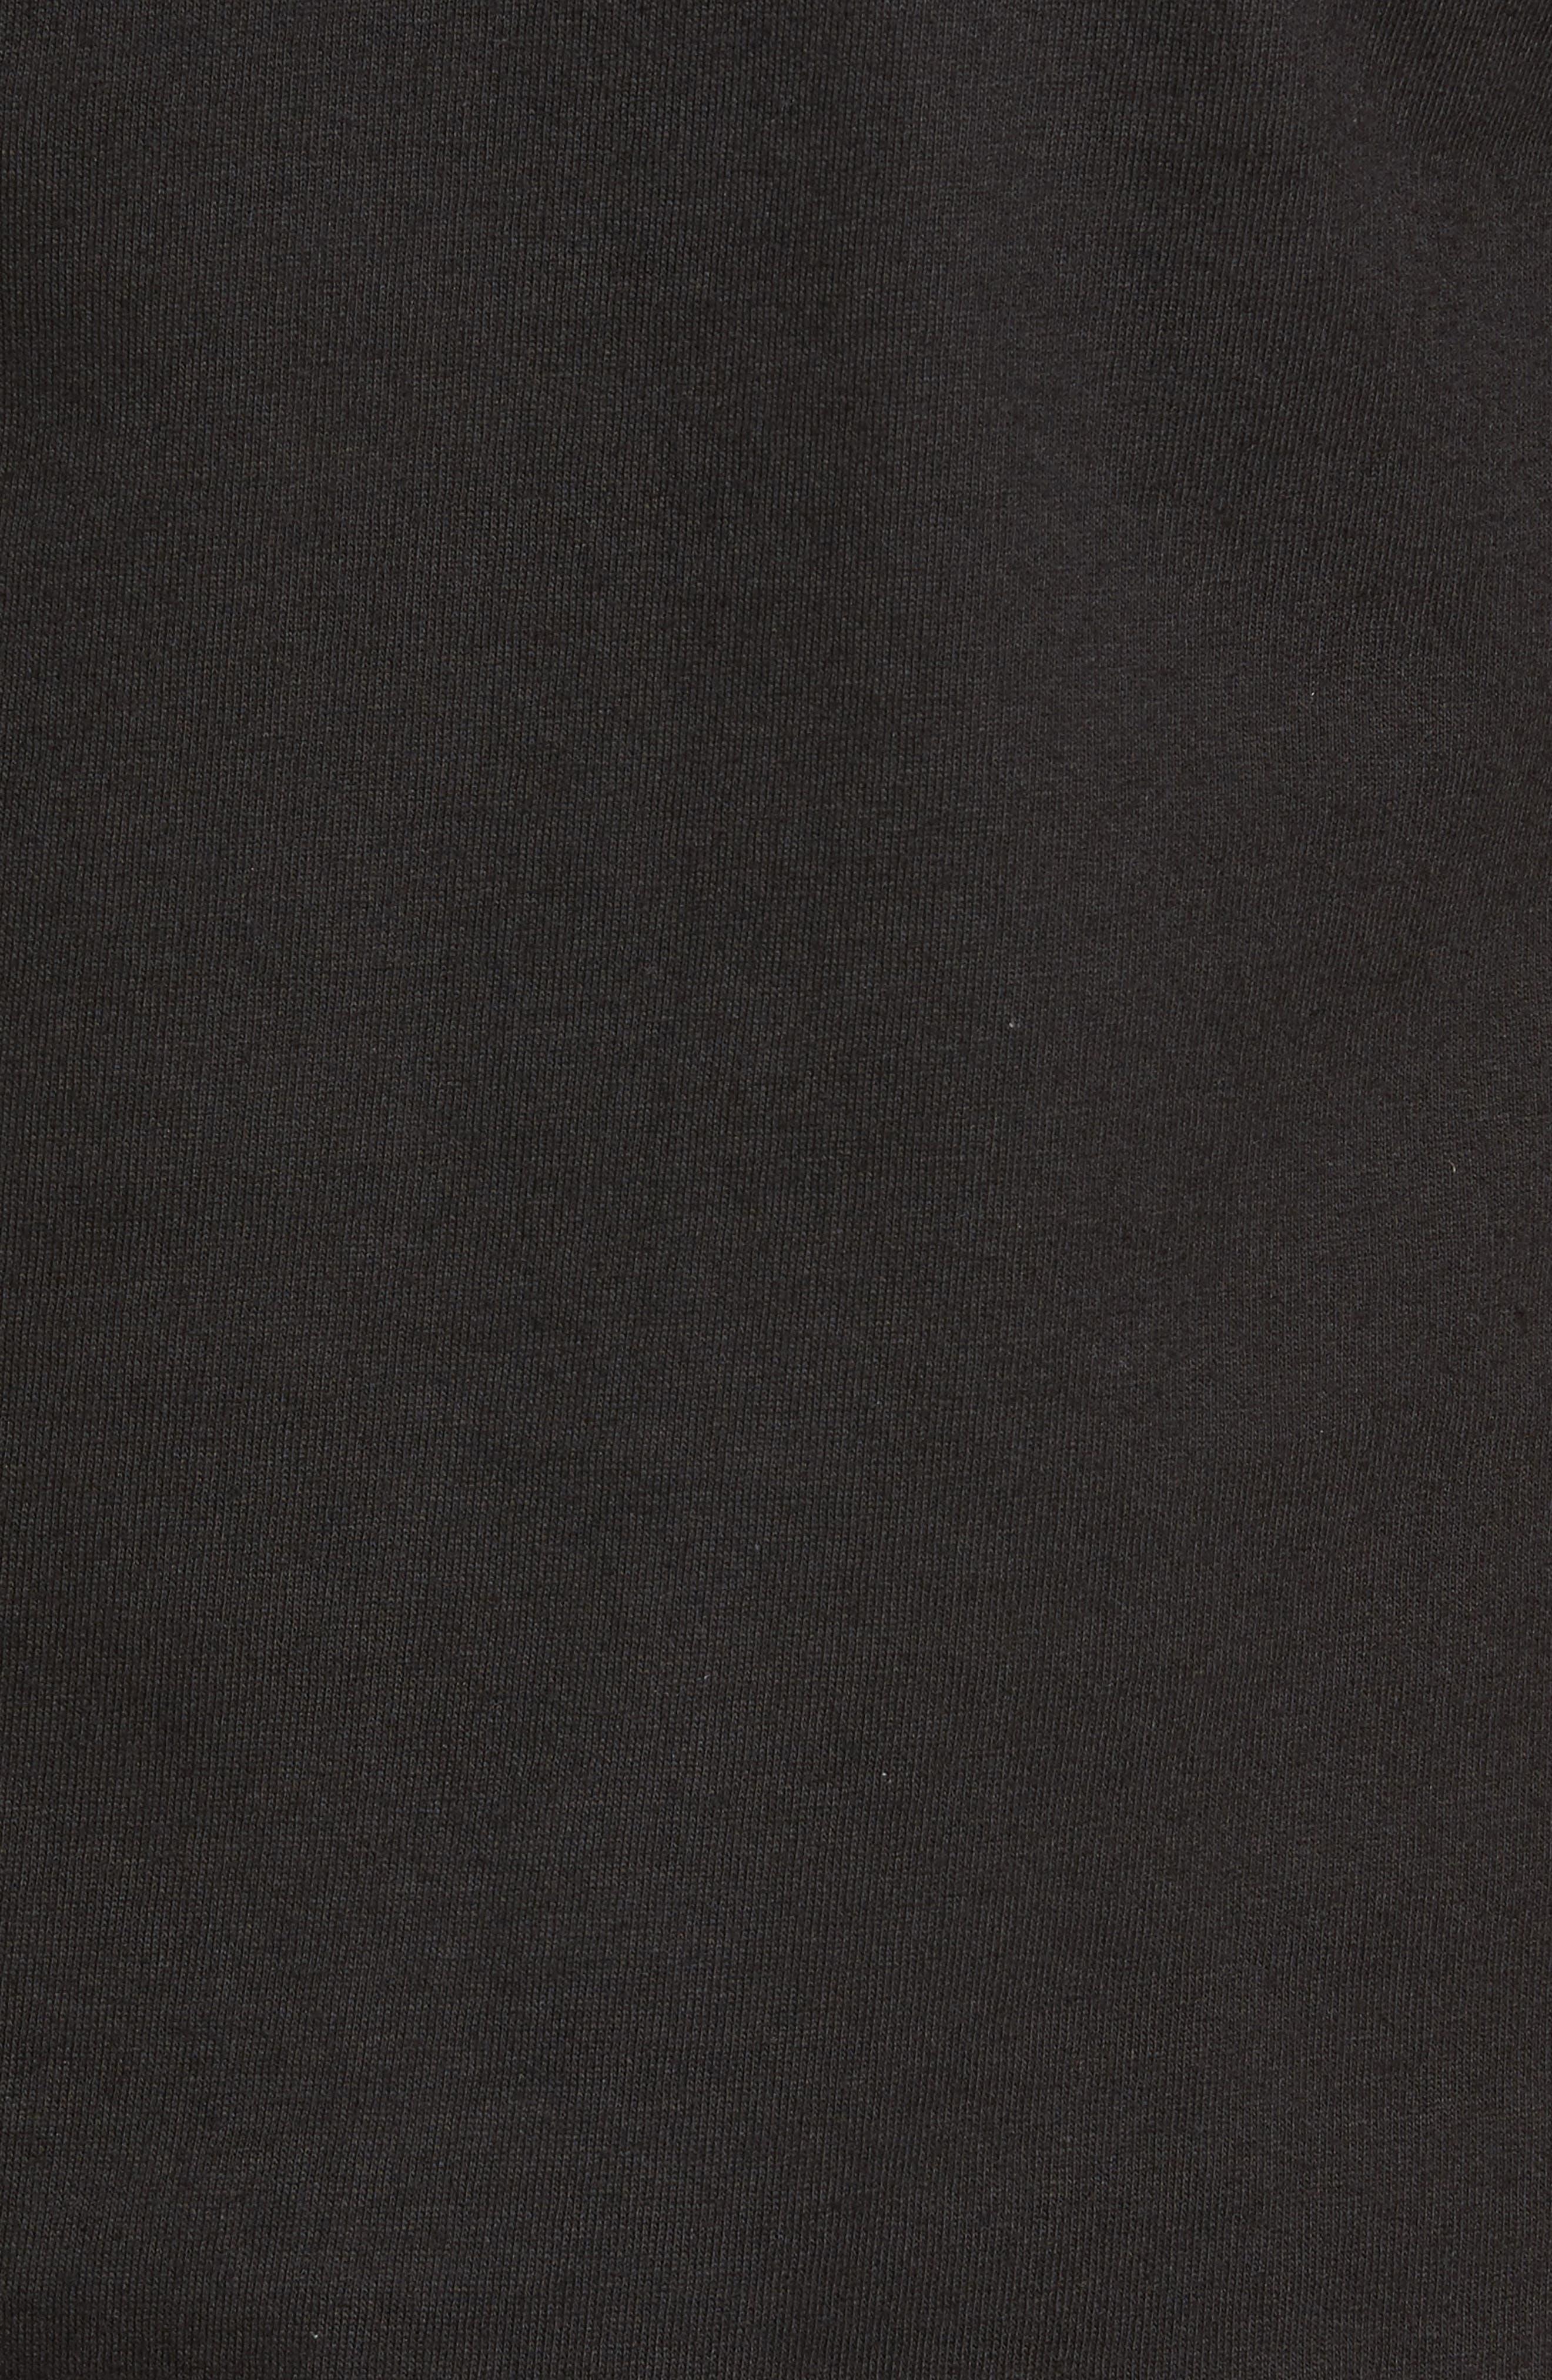 Metal Madness Graphic T-Shirt,                             Alternate thumbnail 5, color,                             Black